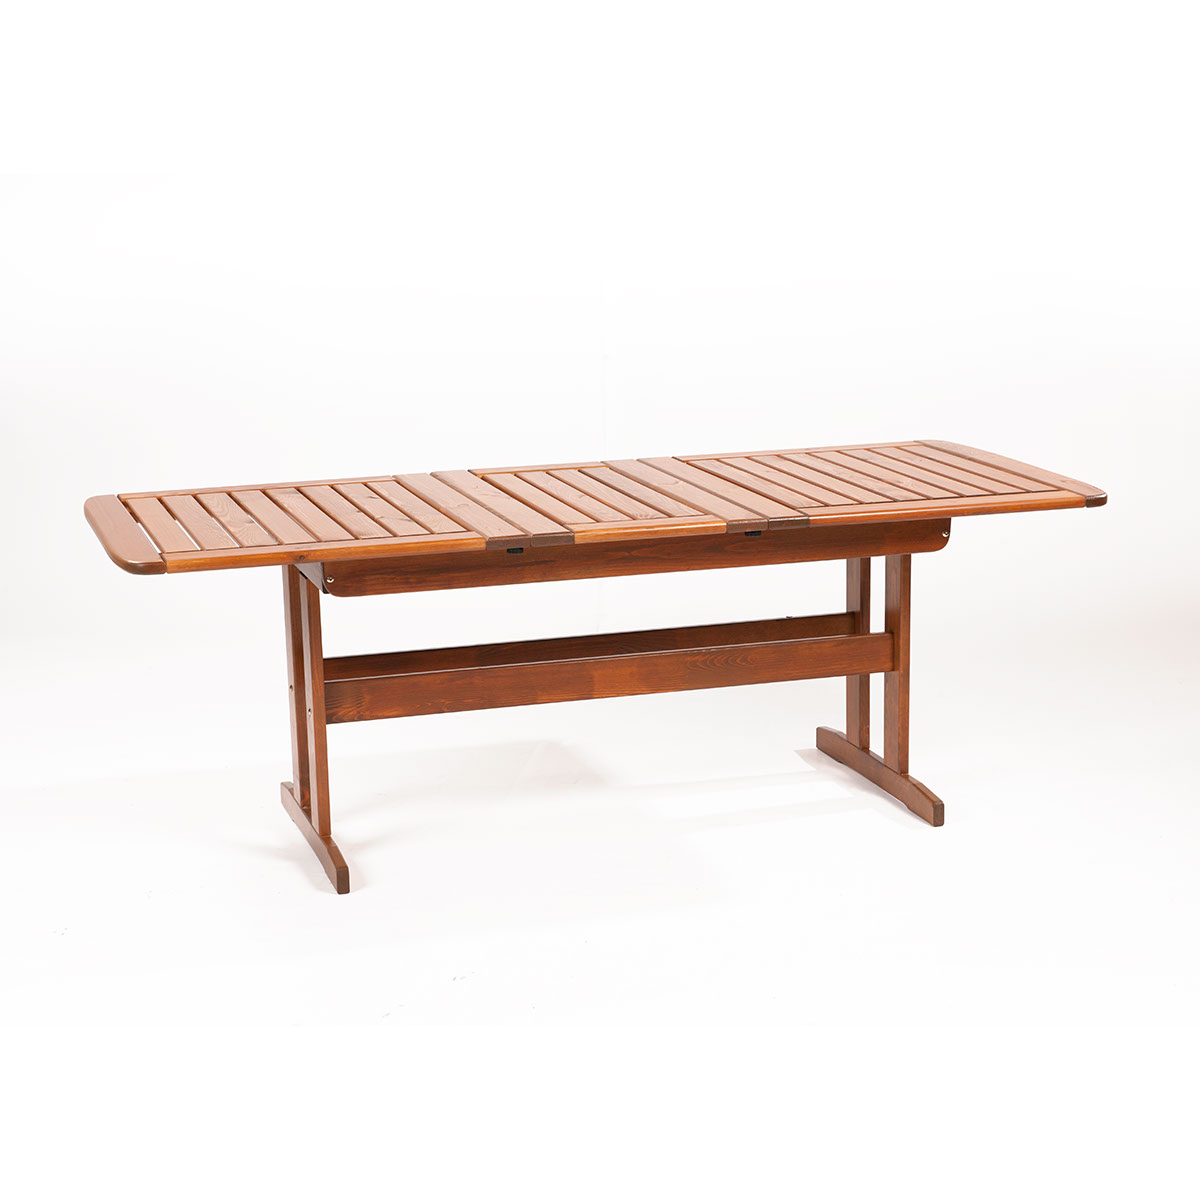 rozkladatelný zahradní stůl z borovice 160/210 x 88 x 73 cm Garland Skeppsvik